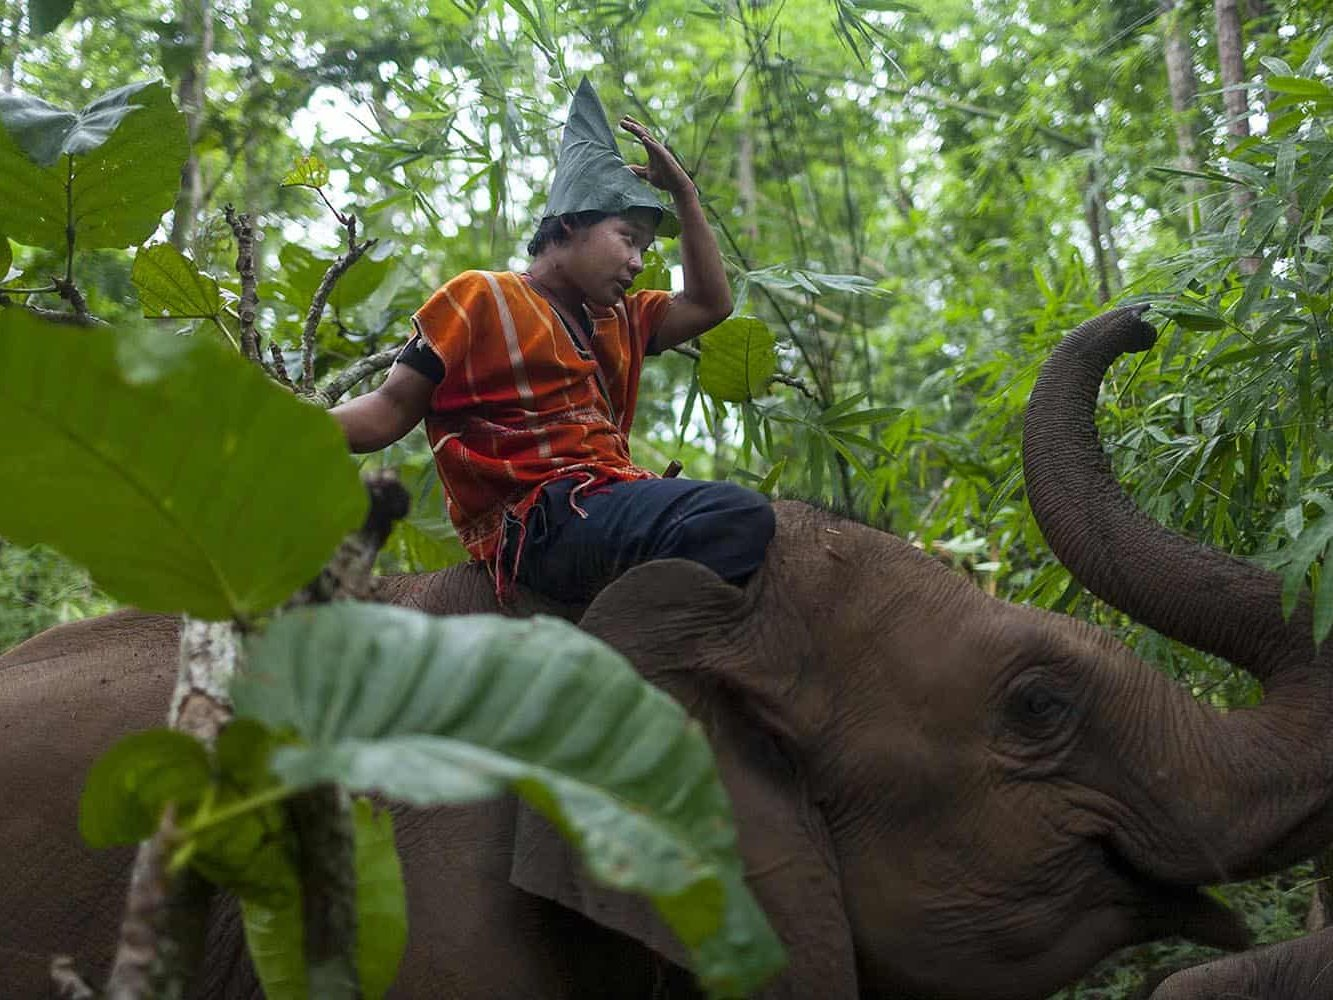 vietnam photographer mahout family binhdang 7